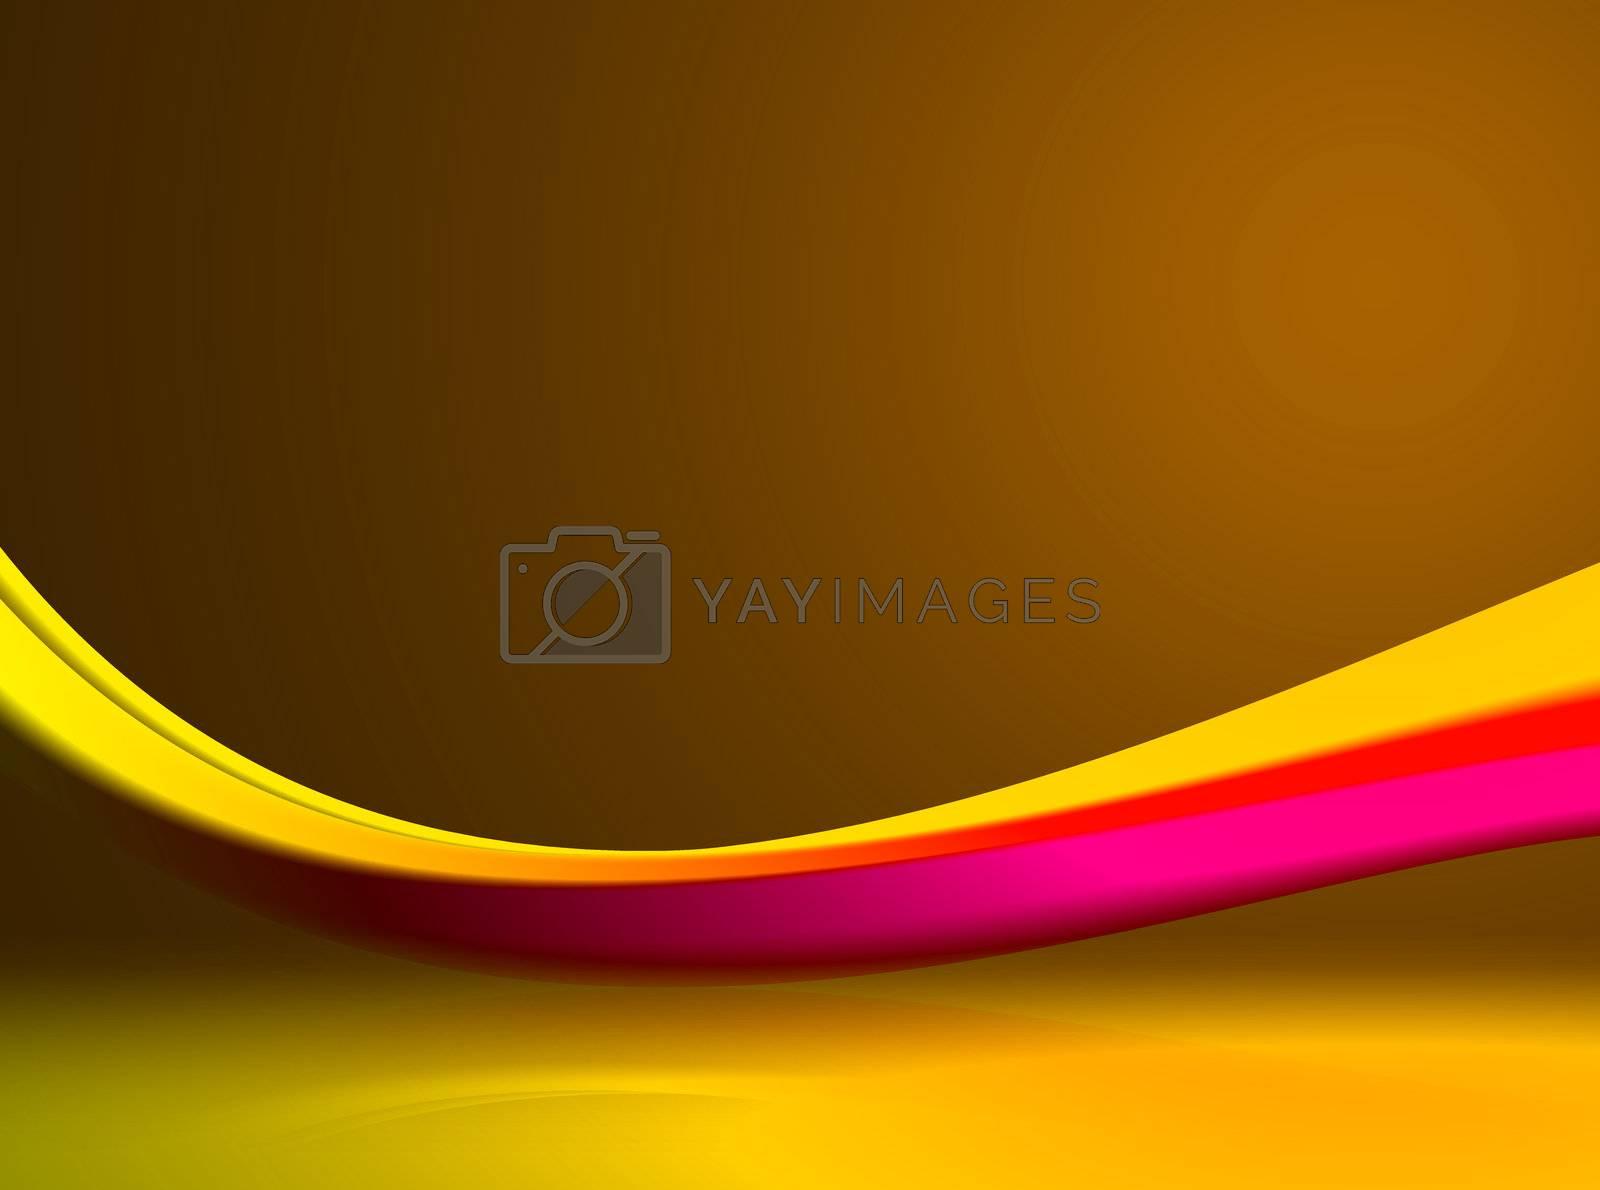 yellow, magenta and orange design. abstract illustration